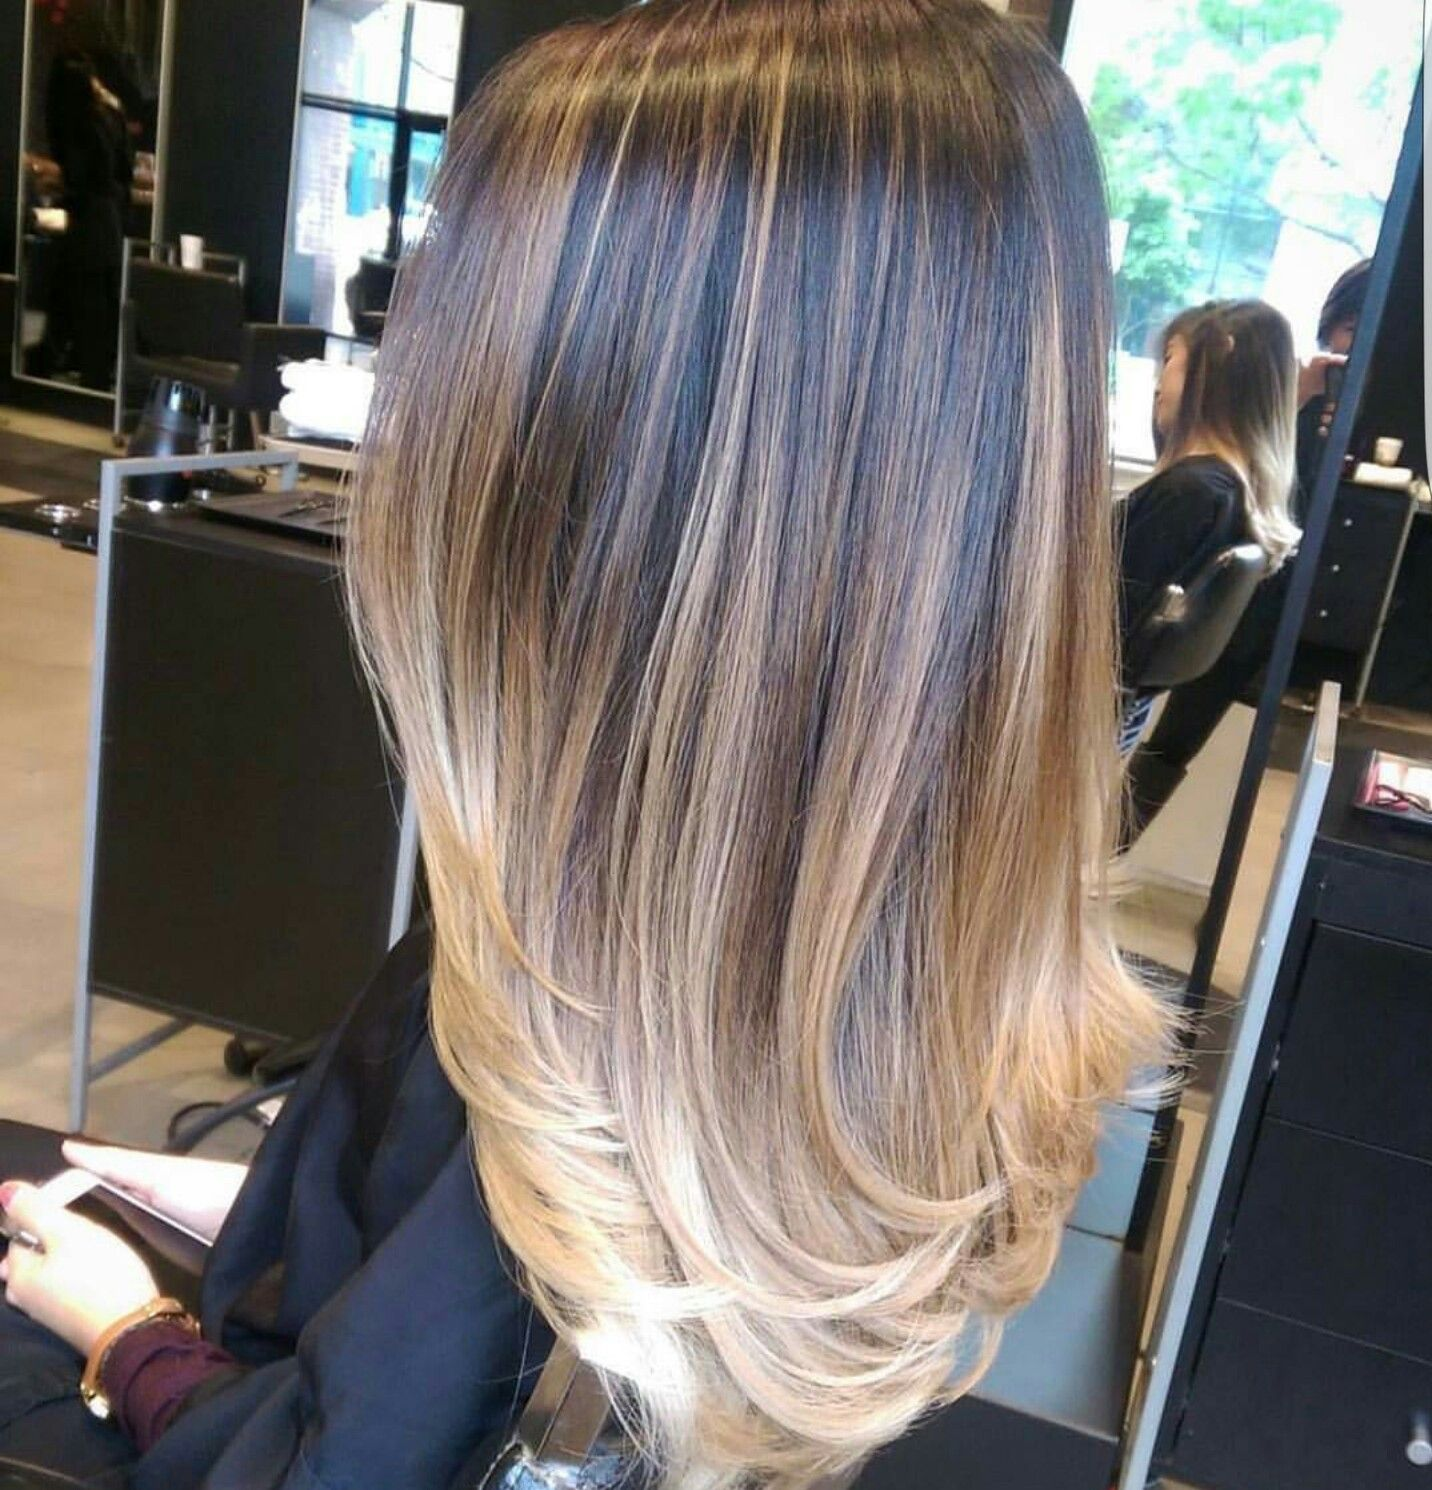 Pin Von Rebekka Giesbrecht Auf Color De Cabello Balayage Haare Blond Haare Balayage Blondes Haar Balayage